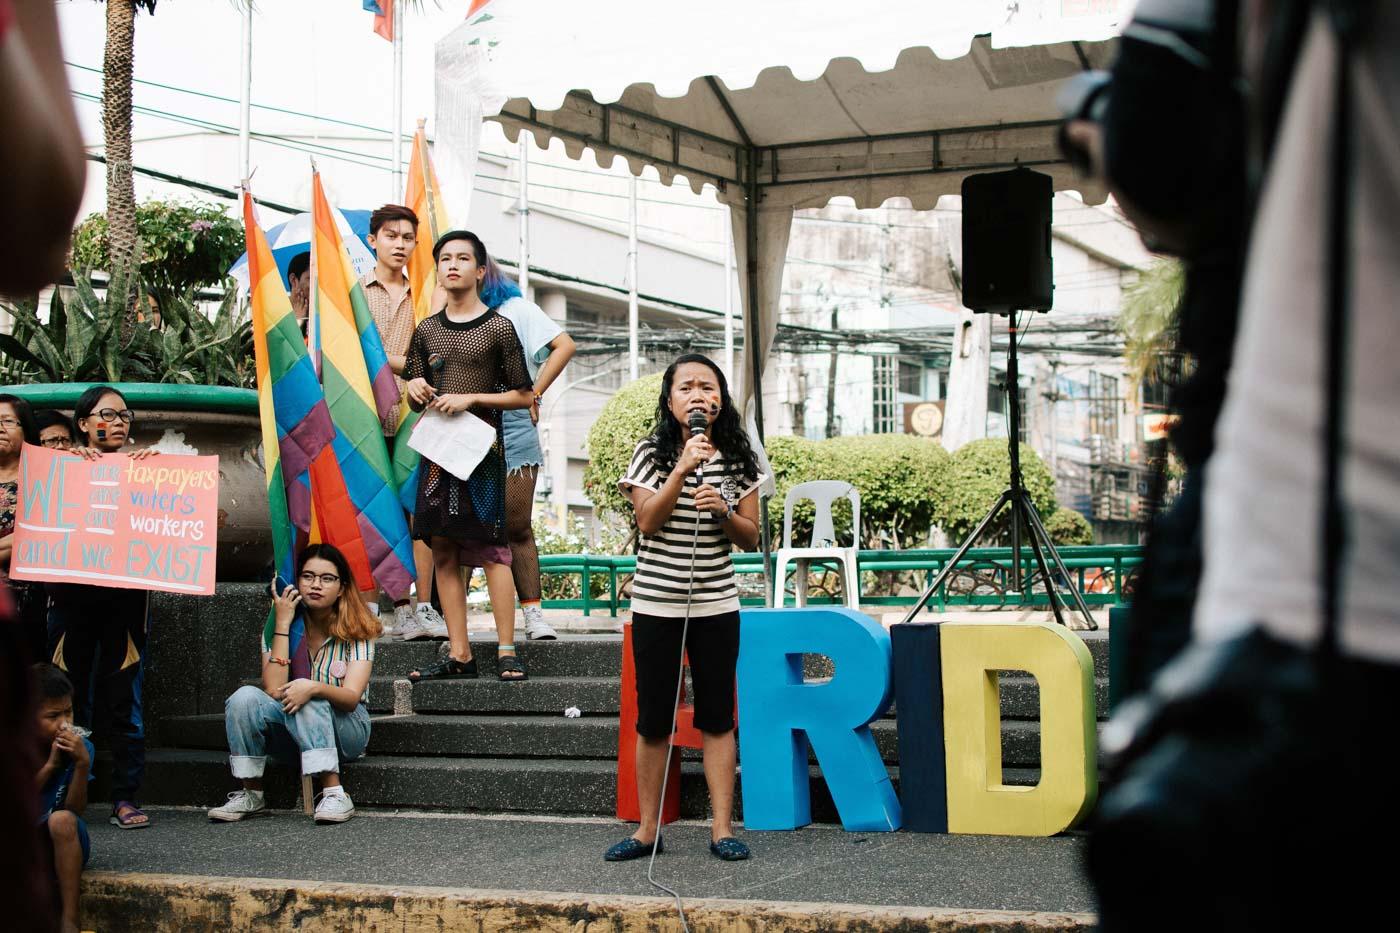 CHANT. 'MAKI-BEKI, huwag ma-shokot!' A representative from Kabataan Partylist leads the crowd in a chant. Photo by Jorge Gamboa